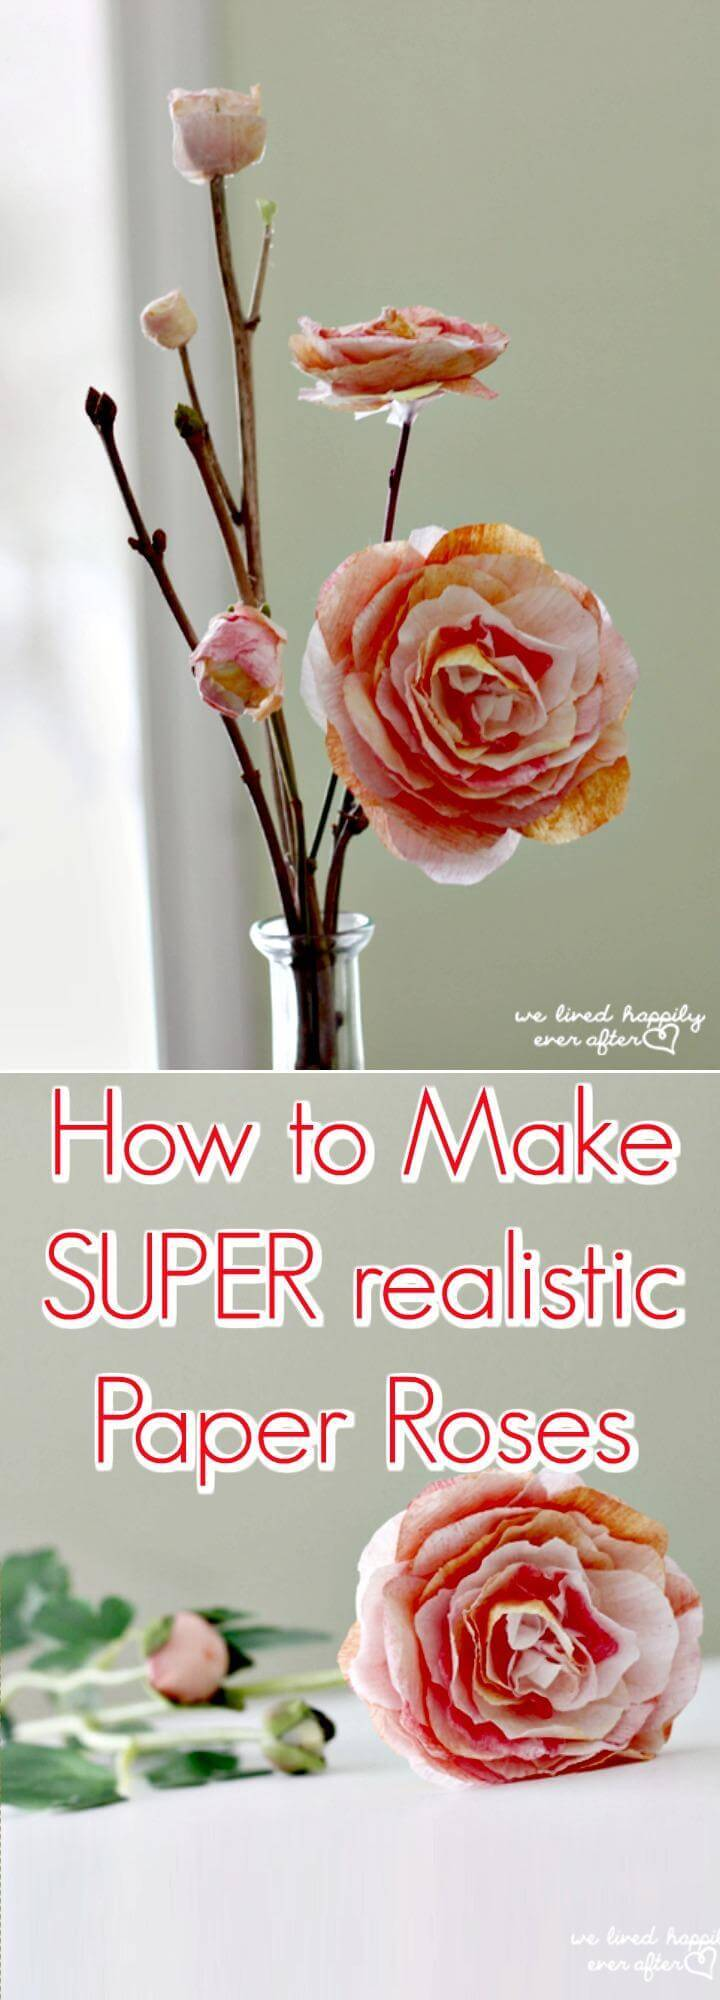 super realistic paper roses tutorial